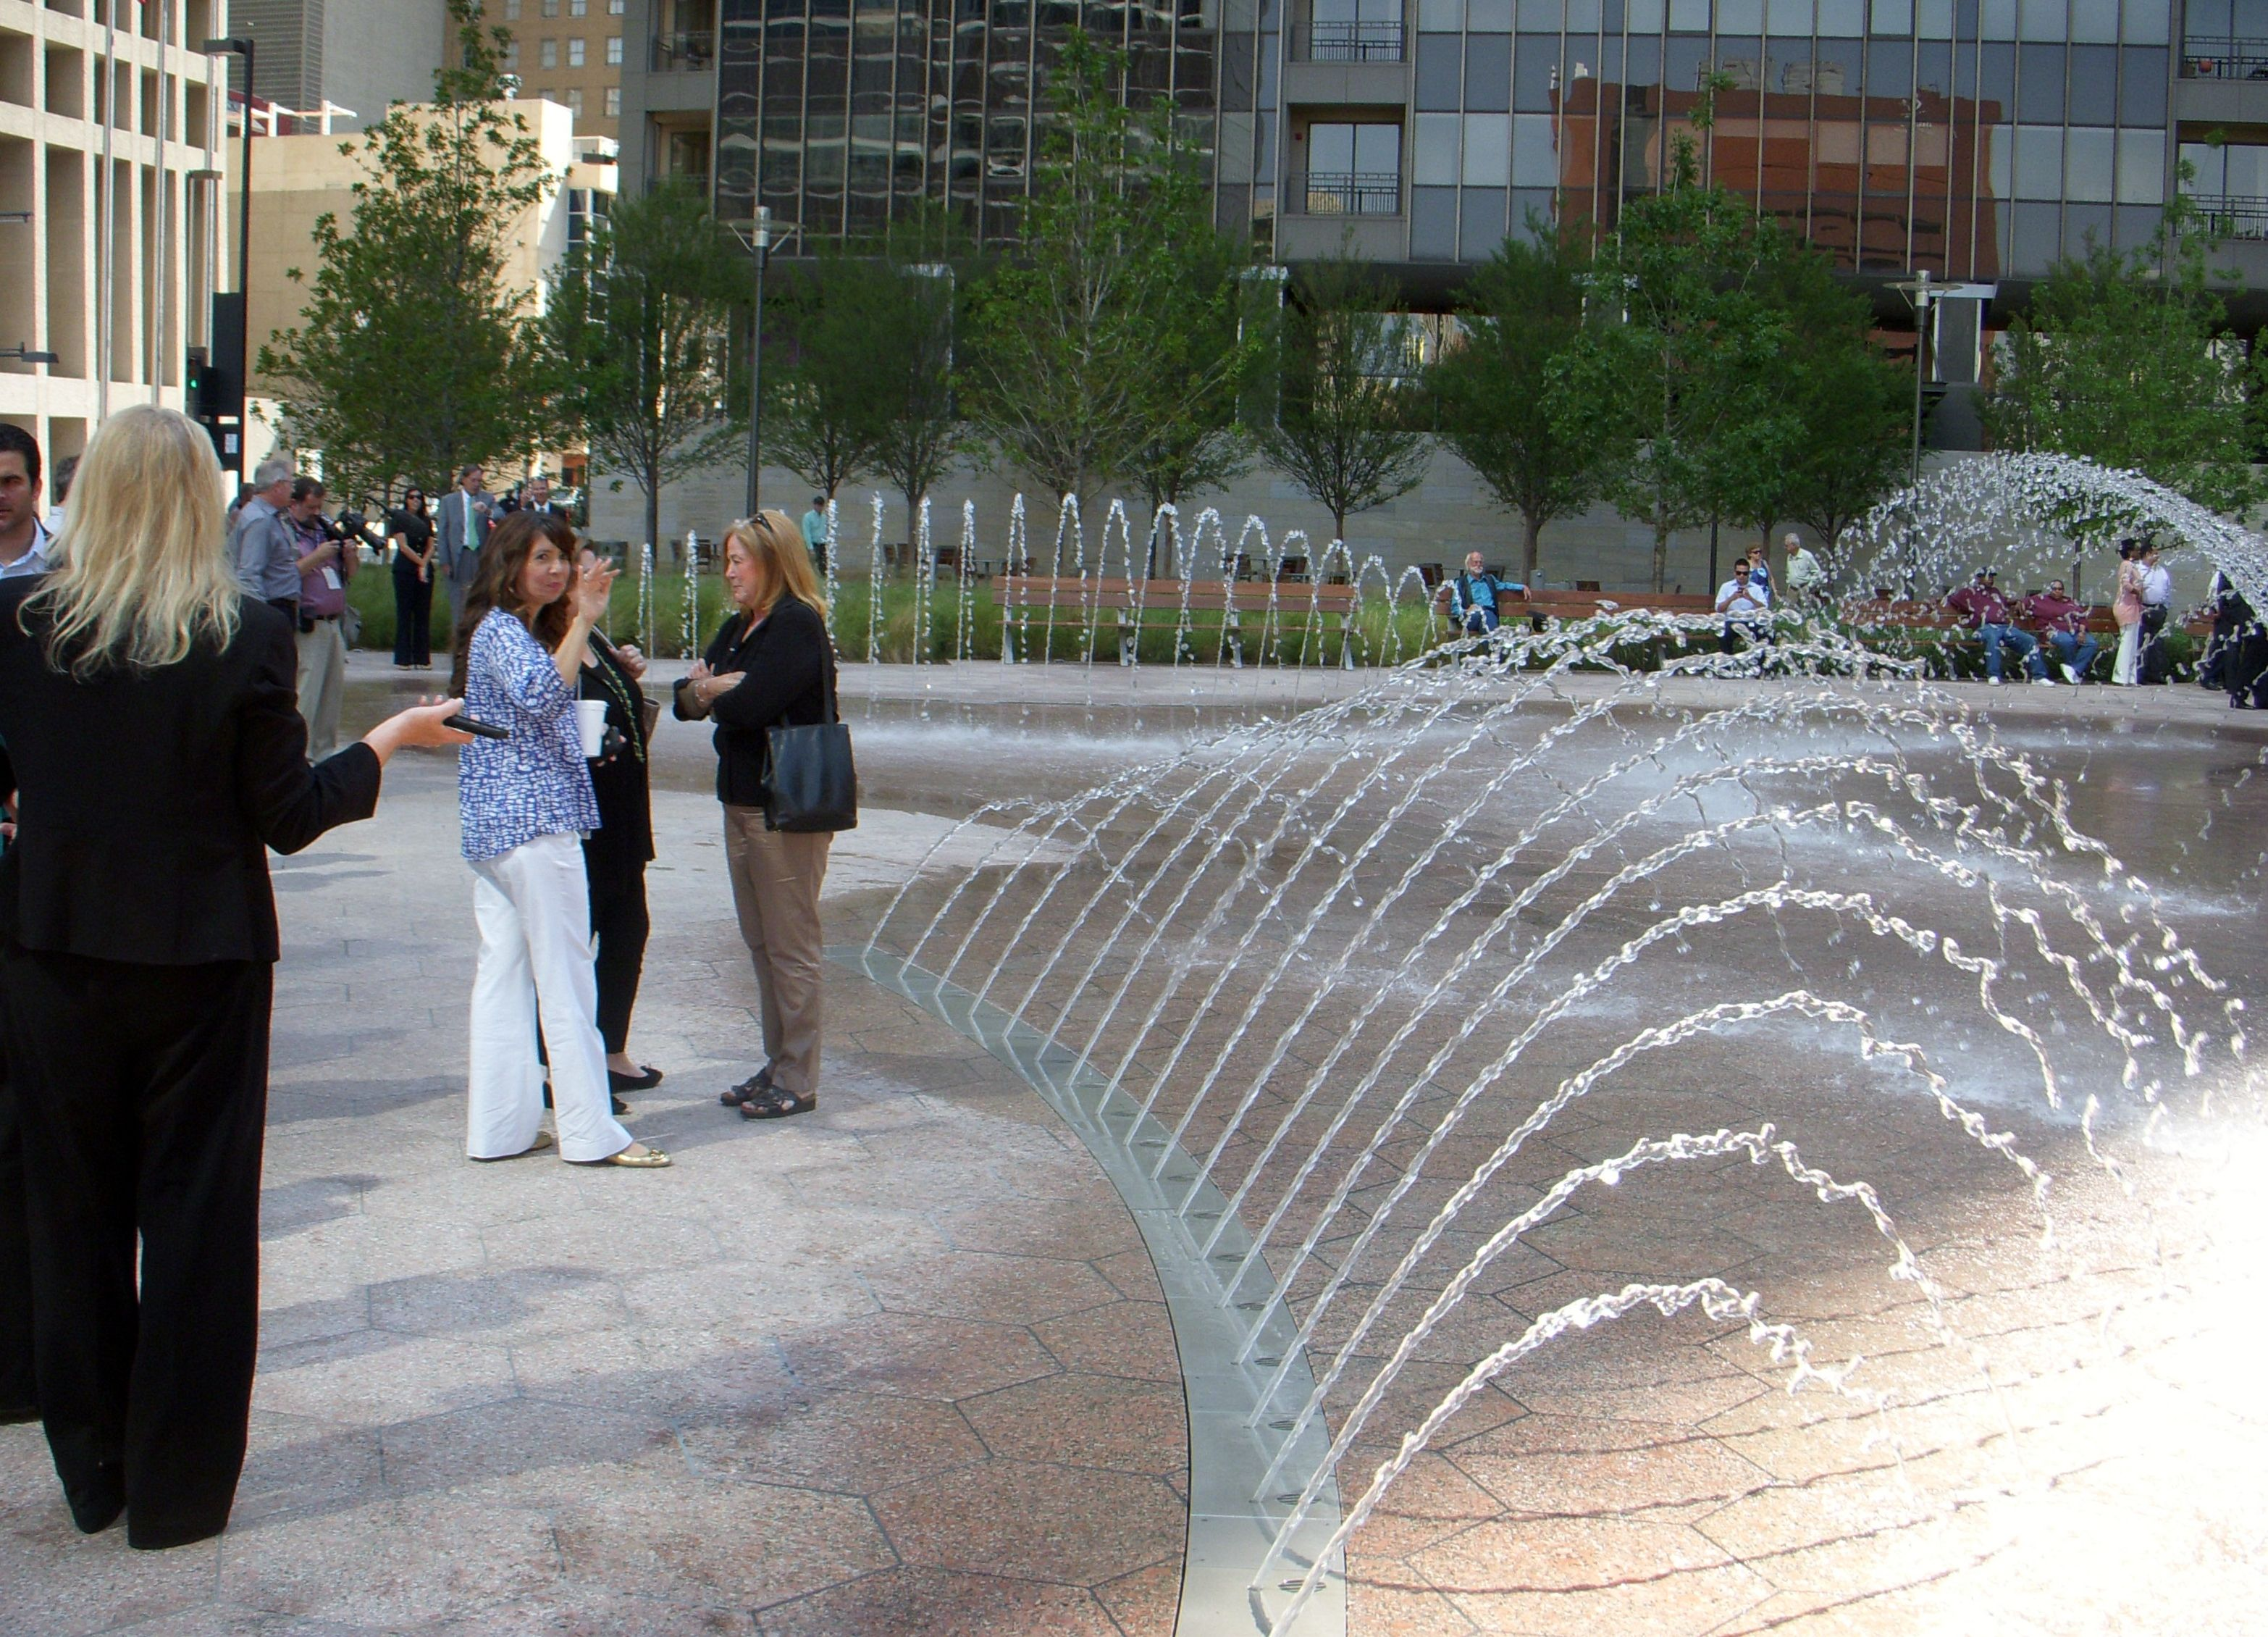 Water fountains dallas - Belo Garden In Downtown Dallas Dallas Texas Hargreaves Associates Www Fountainsdallas Com Water Fountainsdallas